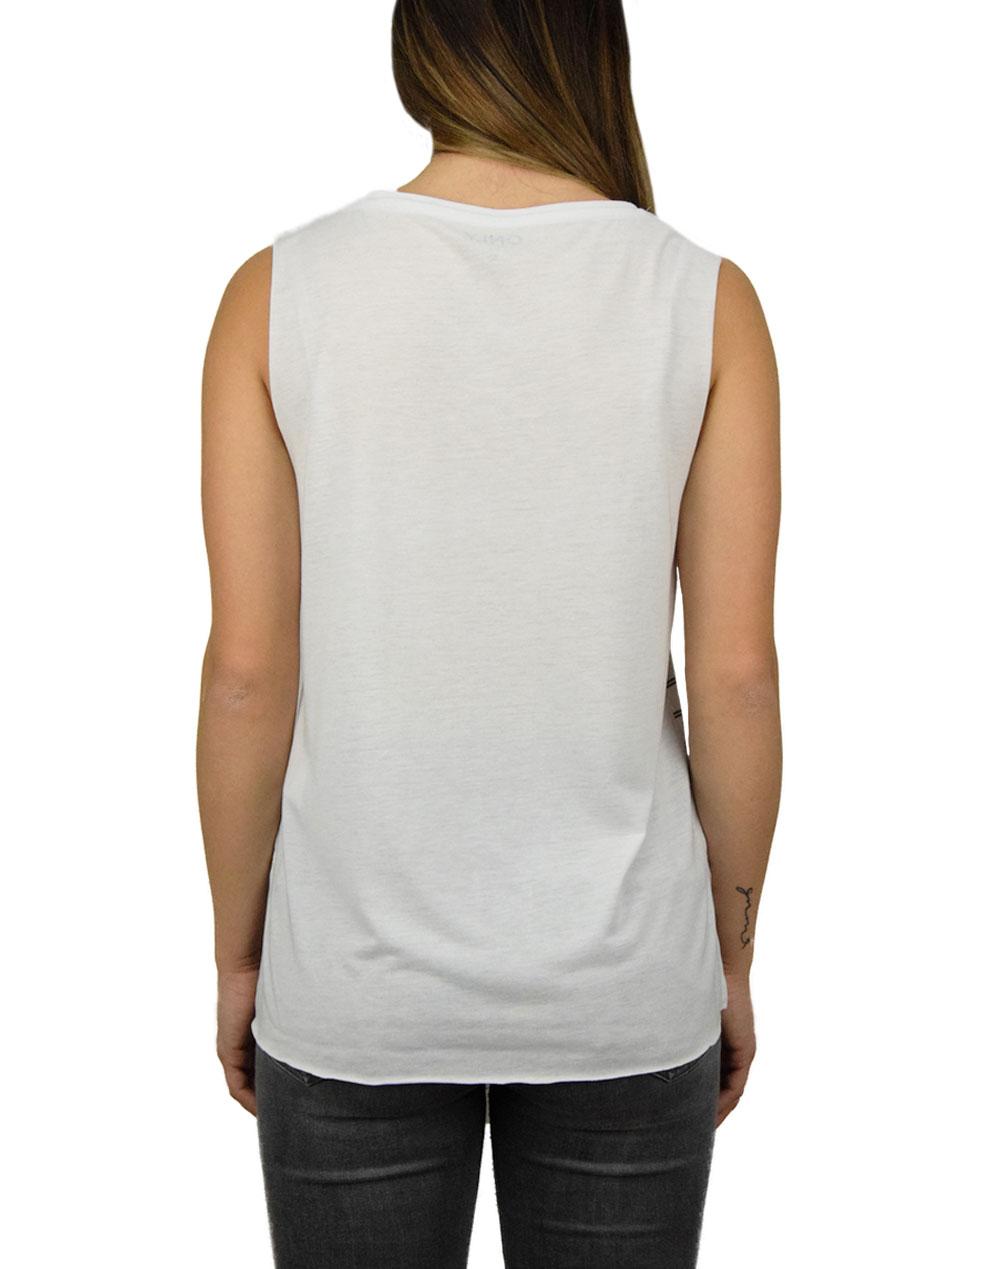 Only Sarah Aqua Girl Top Bright White/Black (15114734)